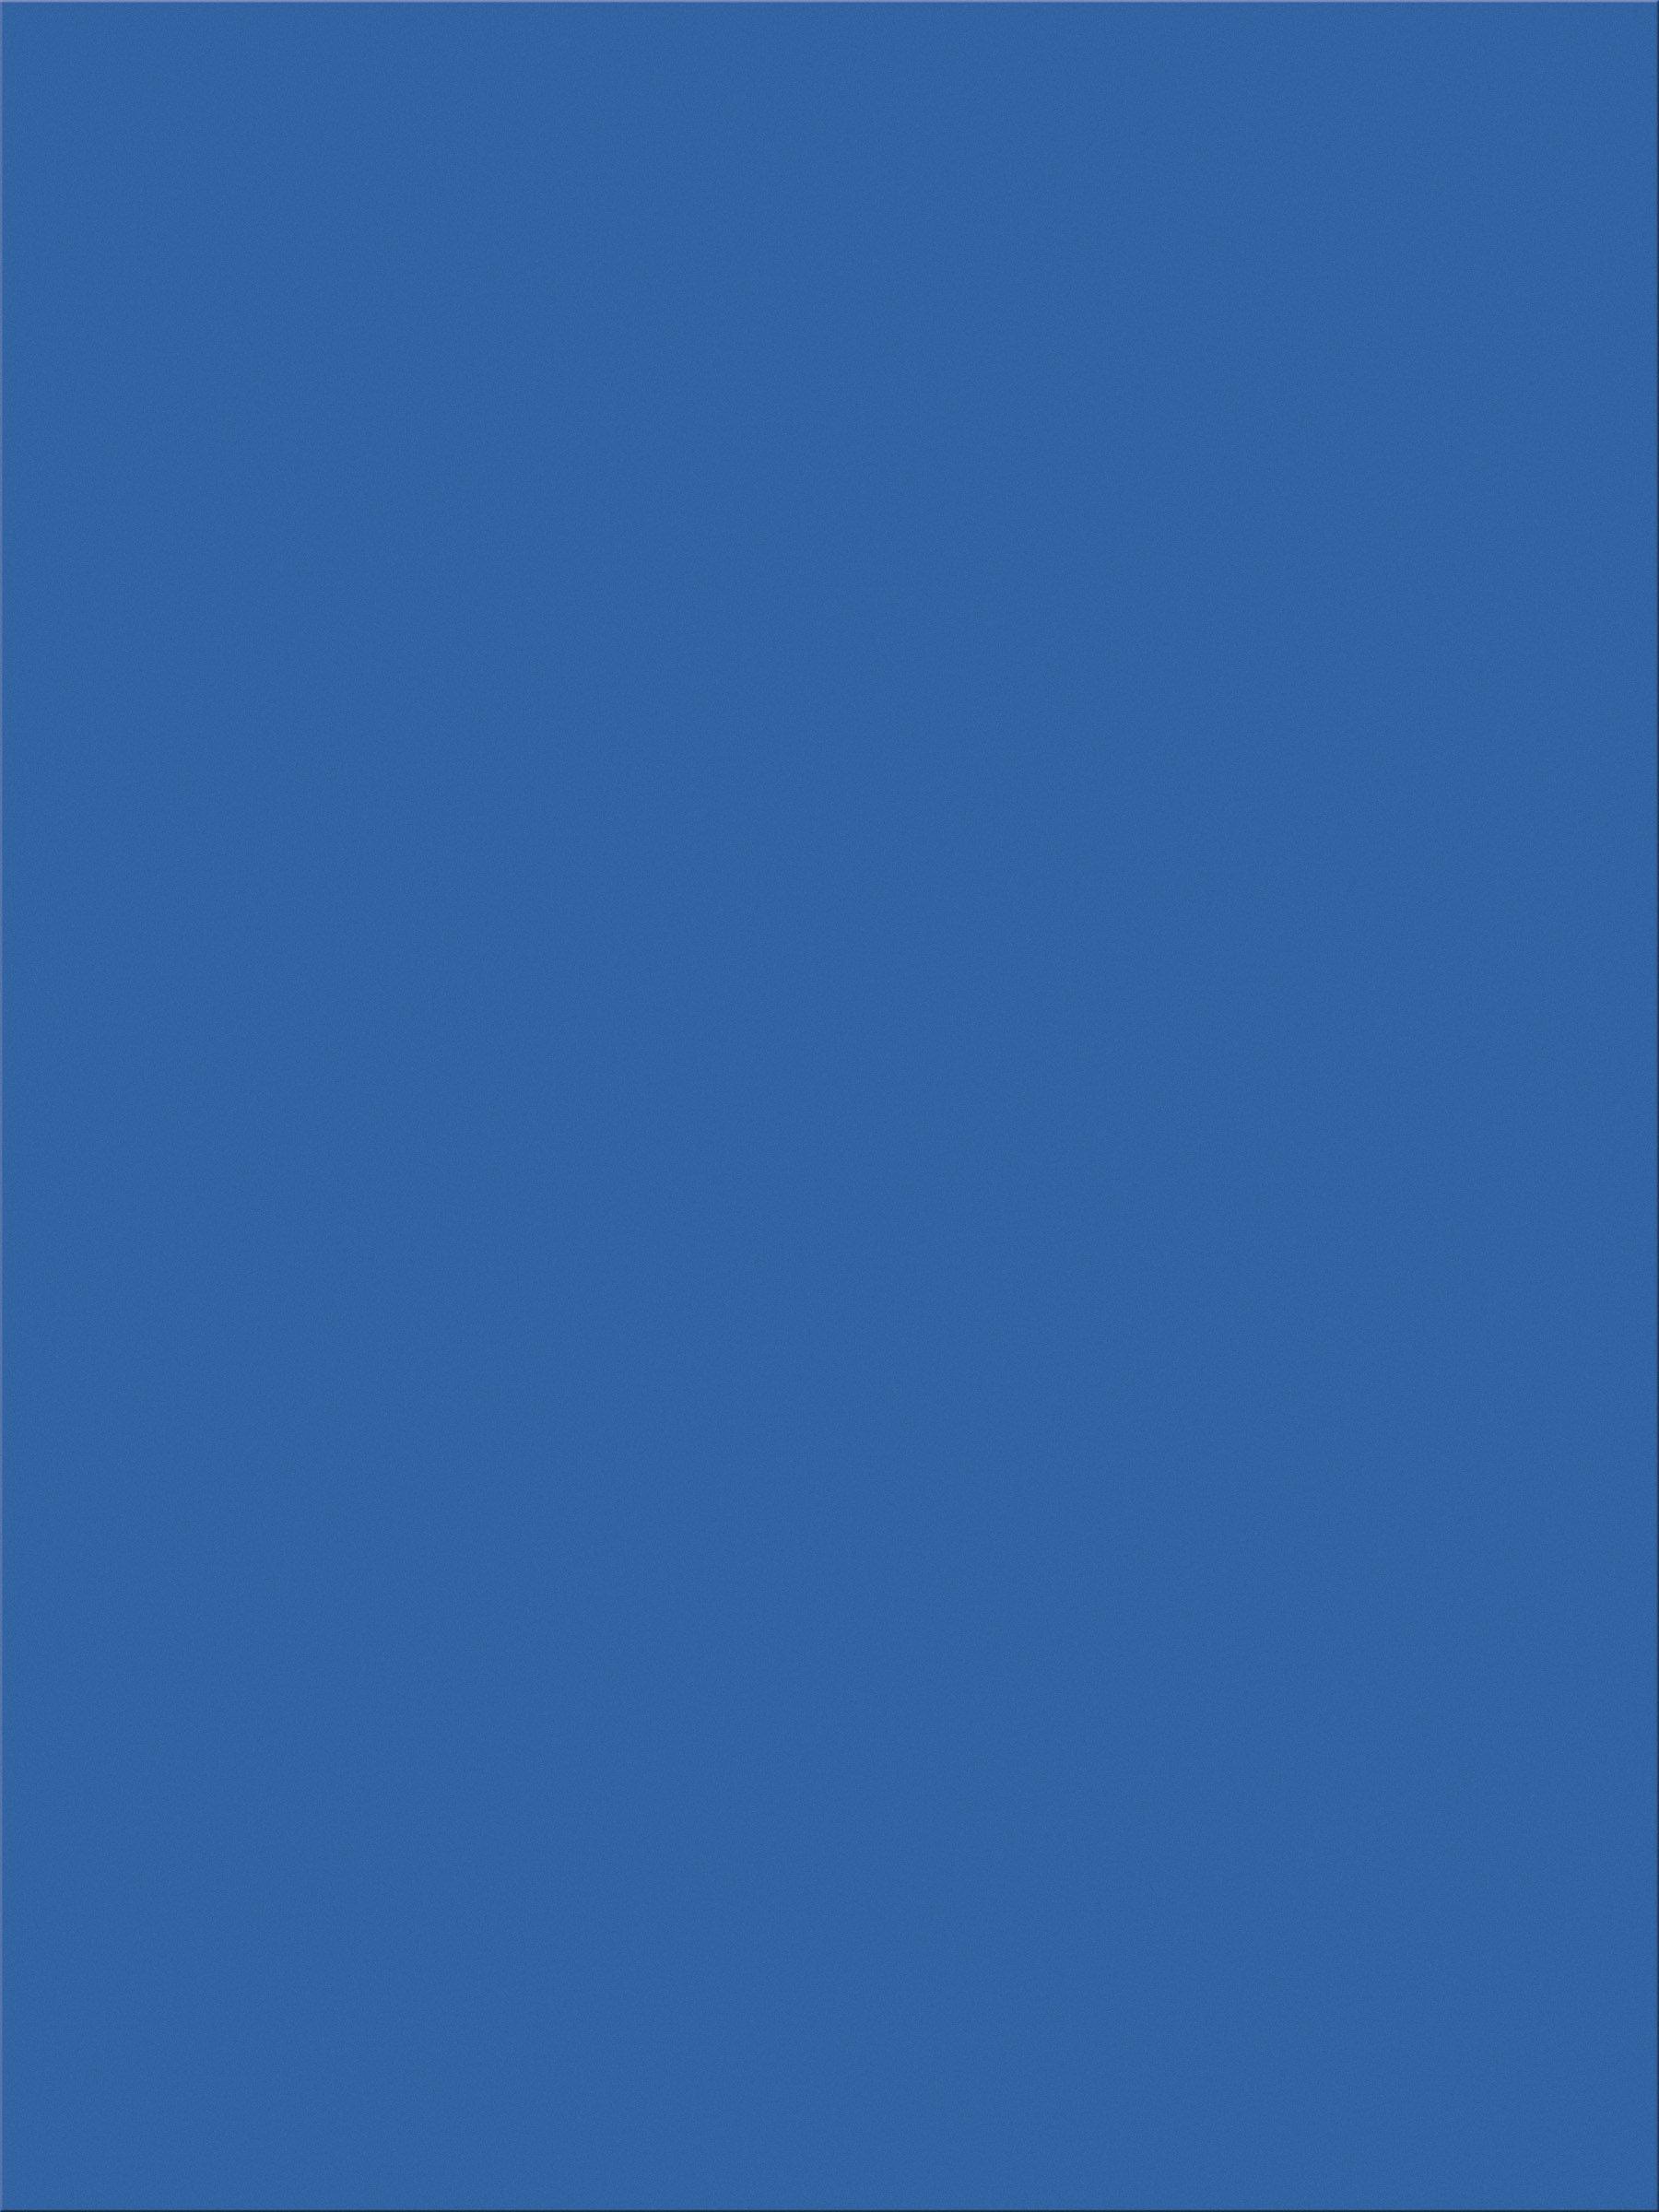 Pacon SunWorks Construction Paper, 9'' x 12'', 100-Count, Dark Blue (7304)